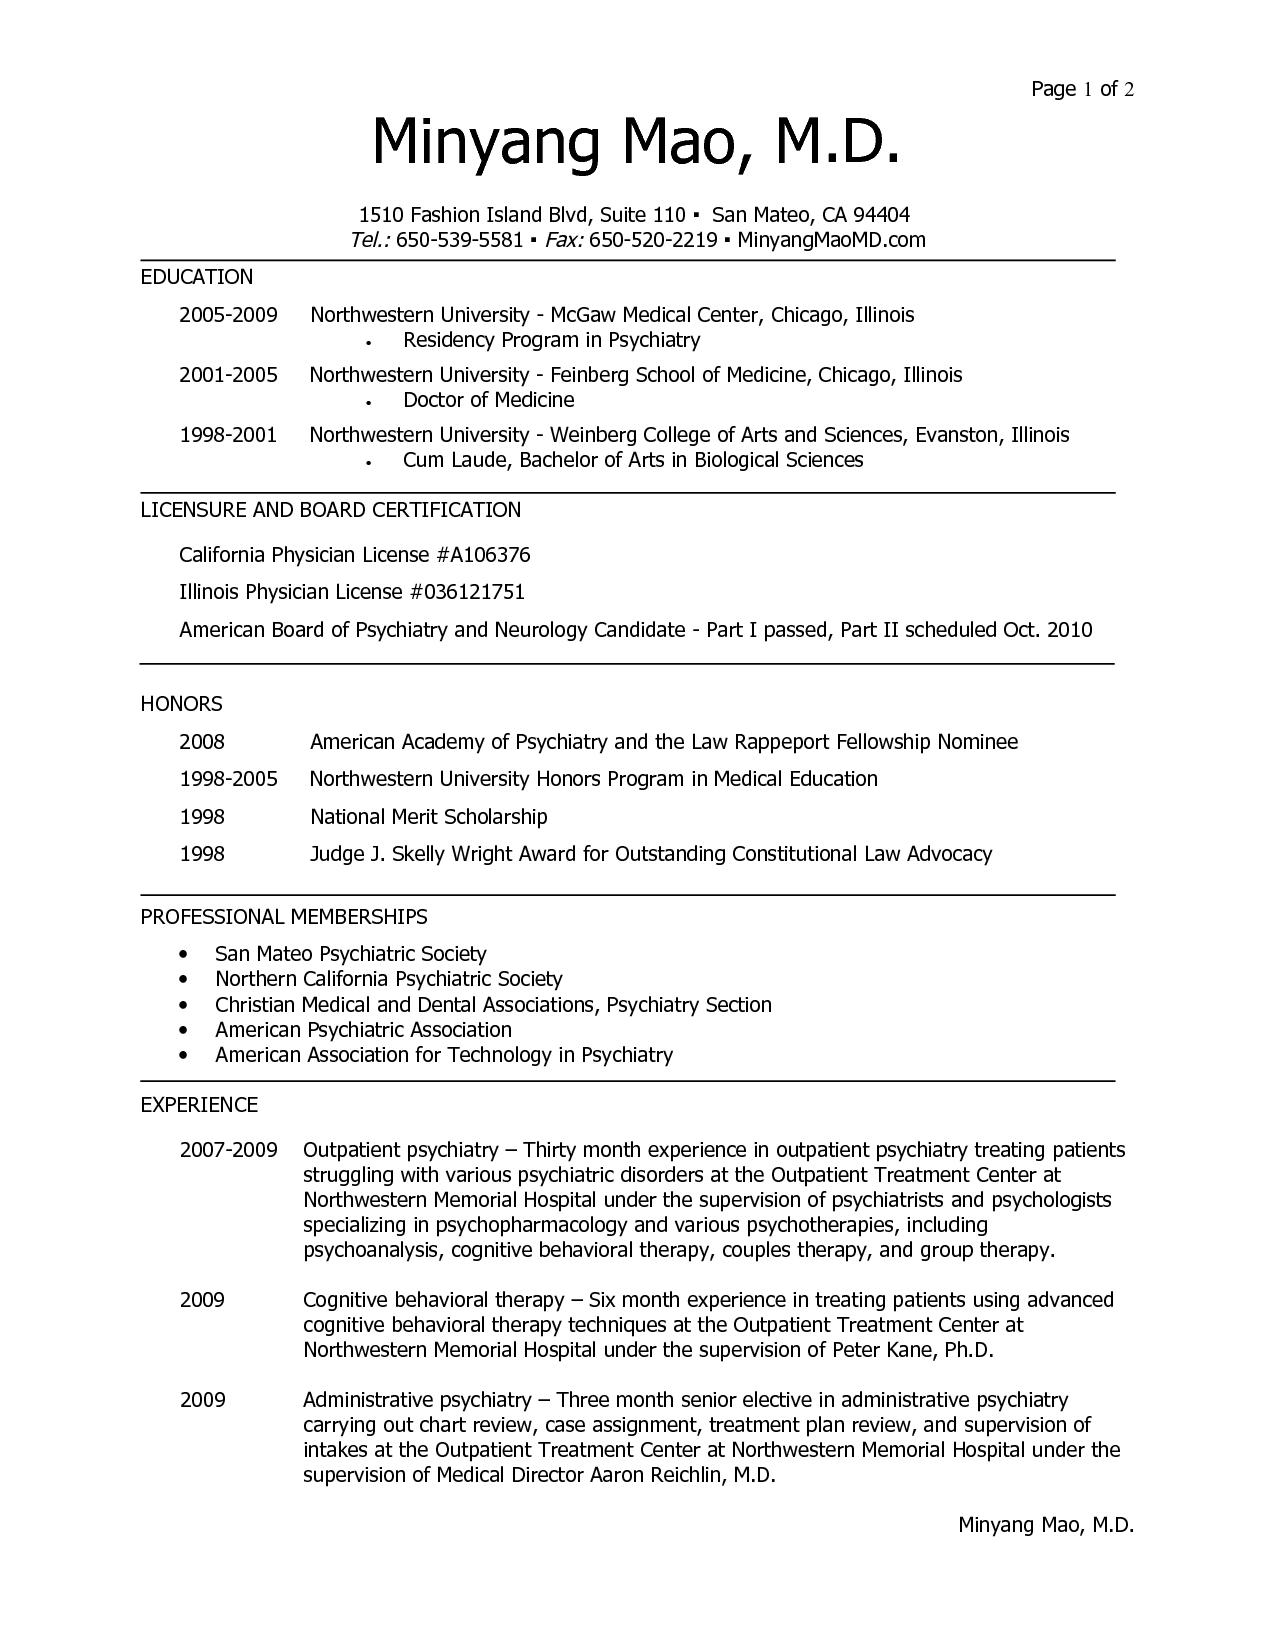 Cv Template Residency